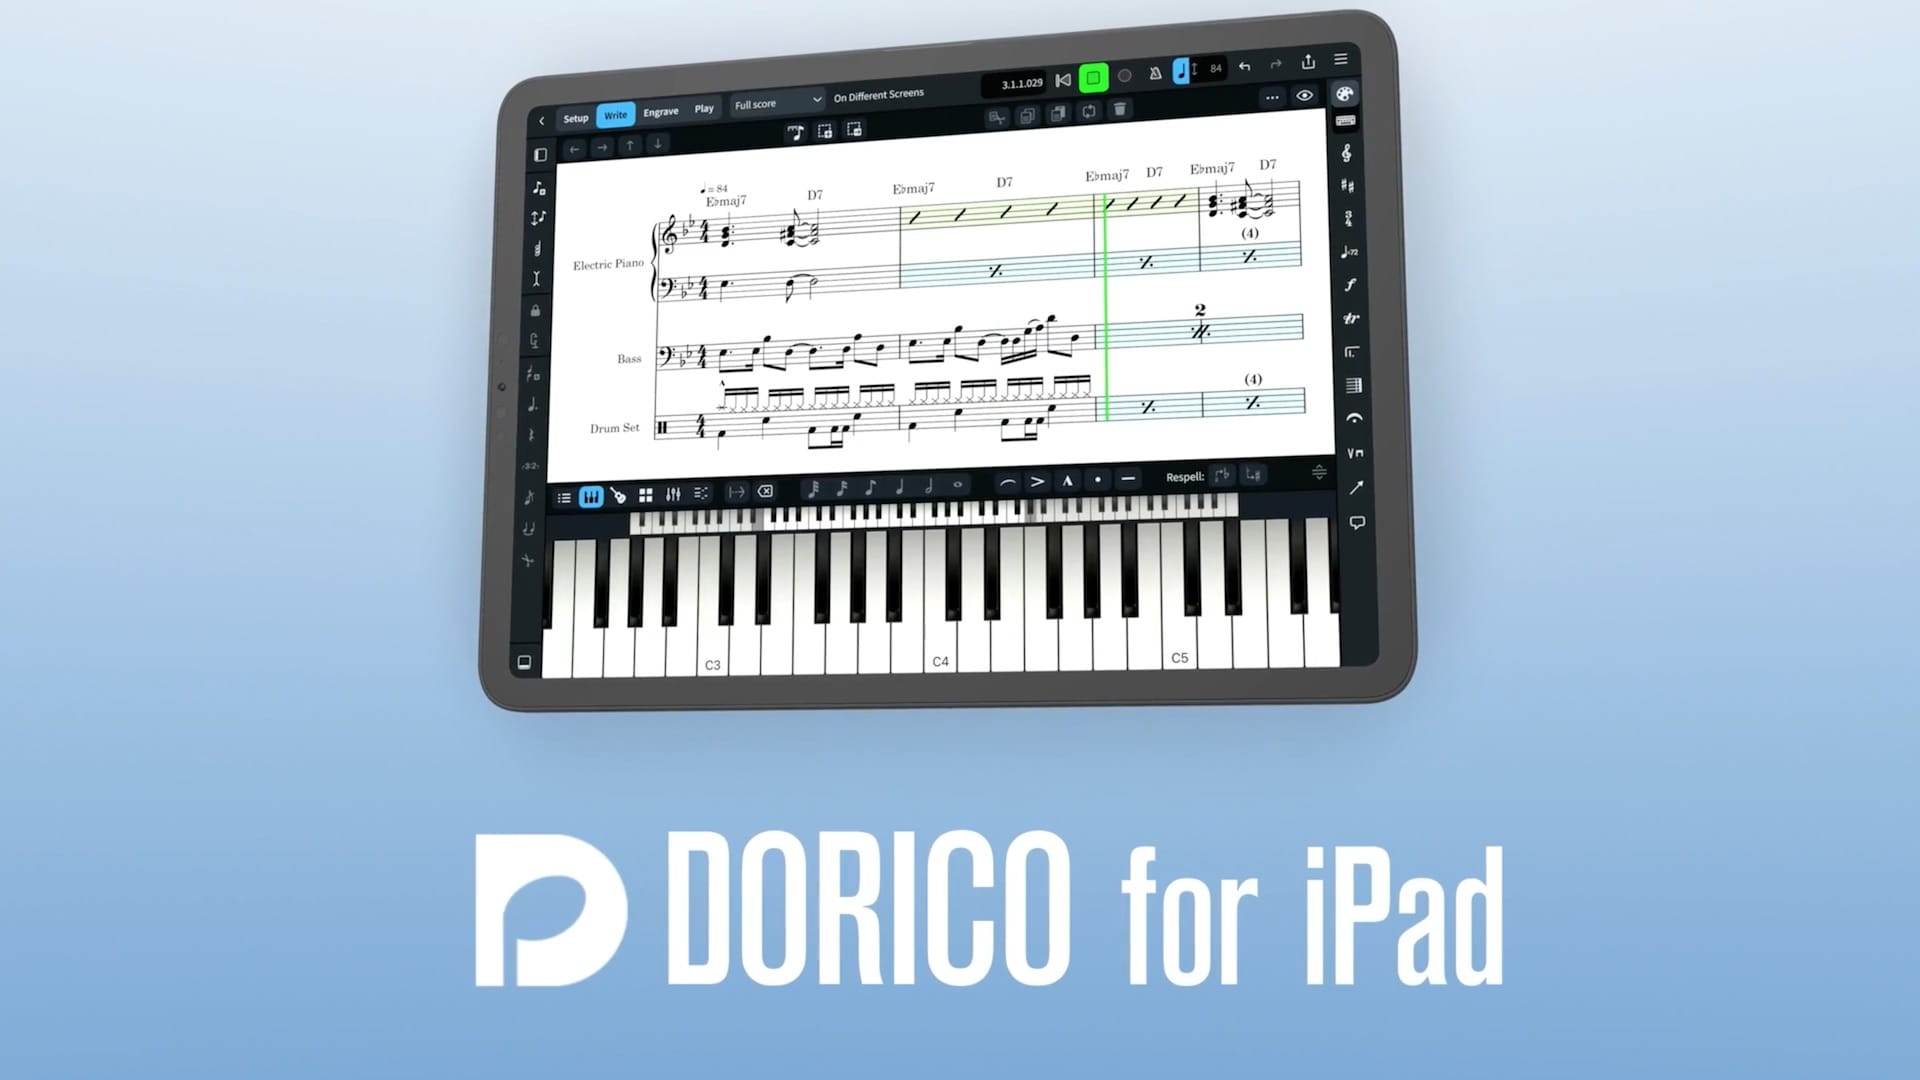 Steinberg、楽譜作成アプリ「Dorico」のiPad版をリリース